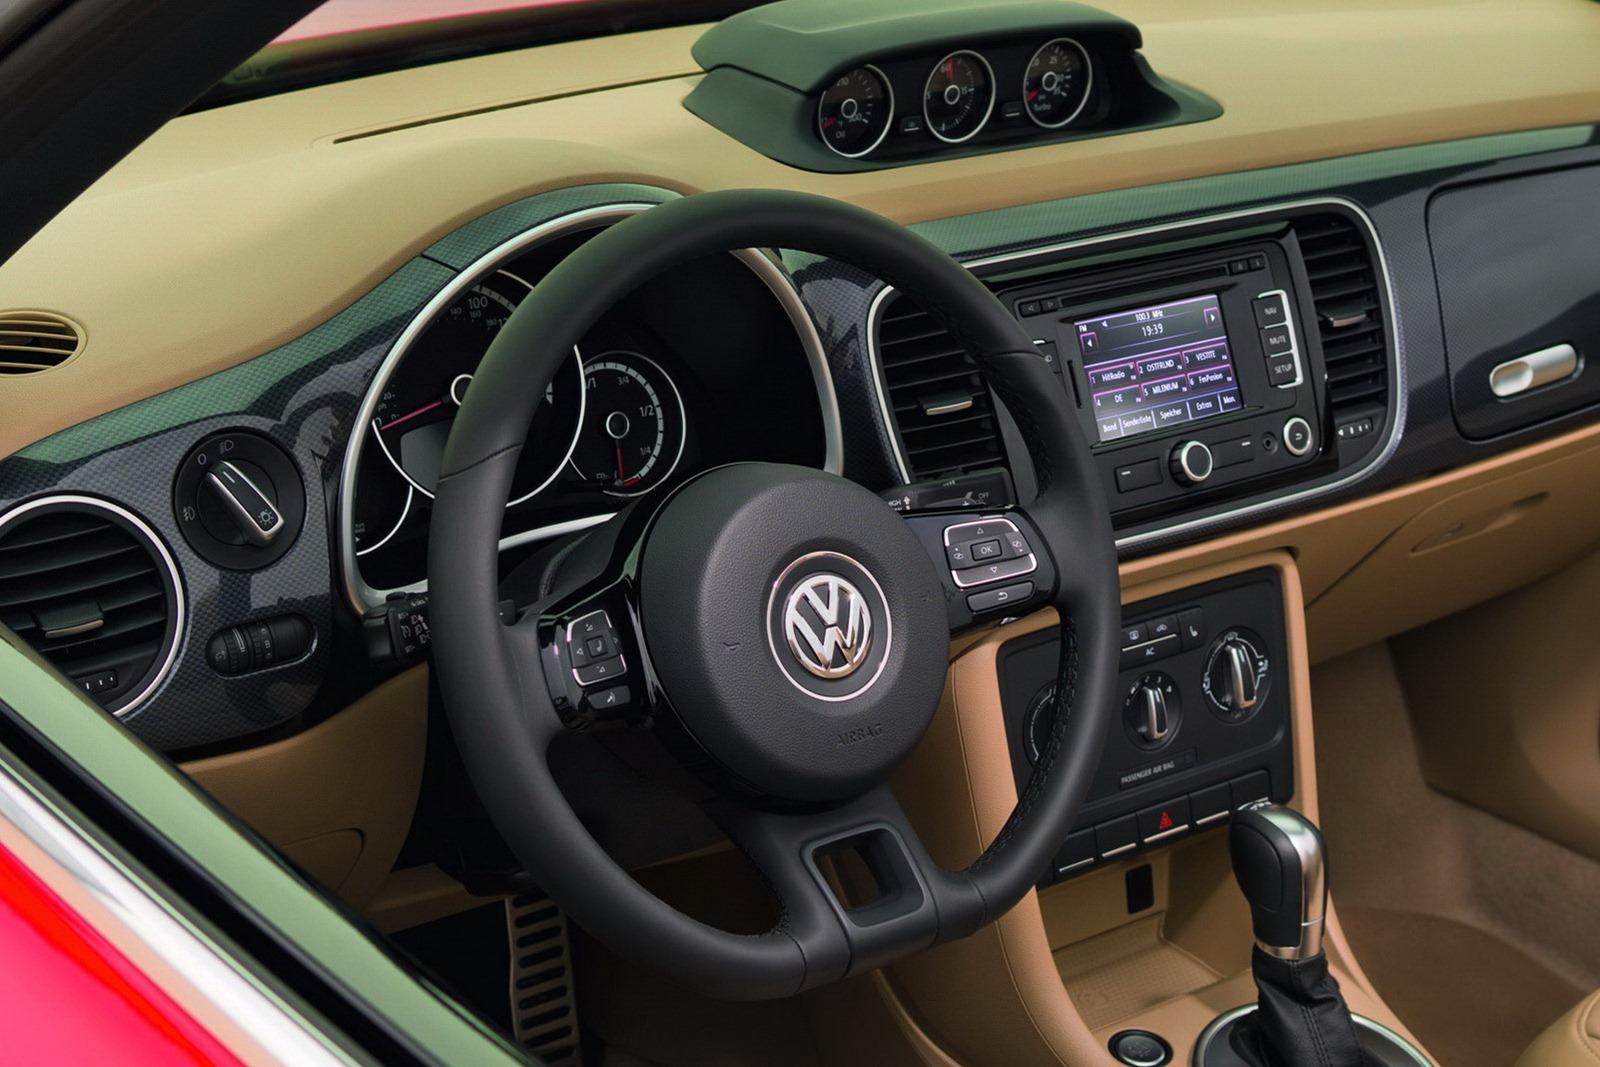 2013 Volkswagen Beetle Convertible Revealed - autoevolution